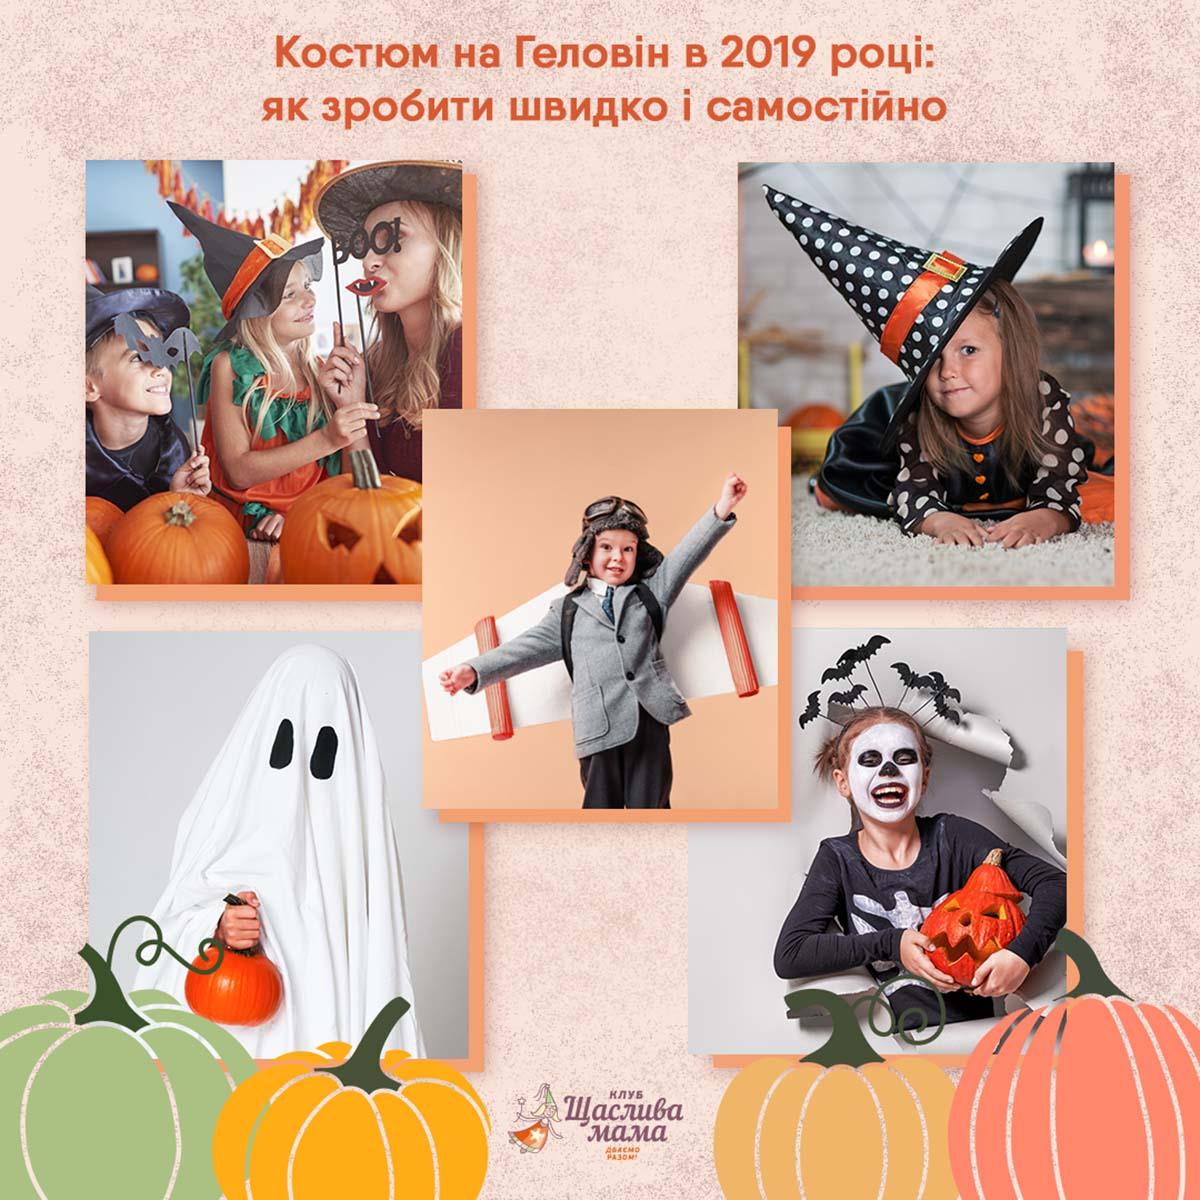 Костюм на Хэллоуин в 2019 году своими руками